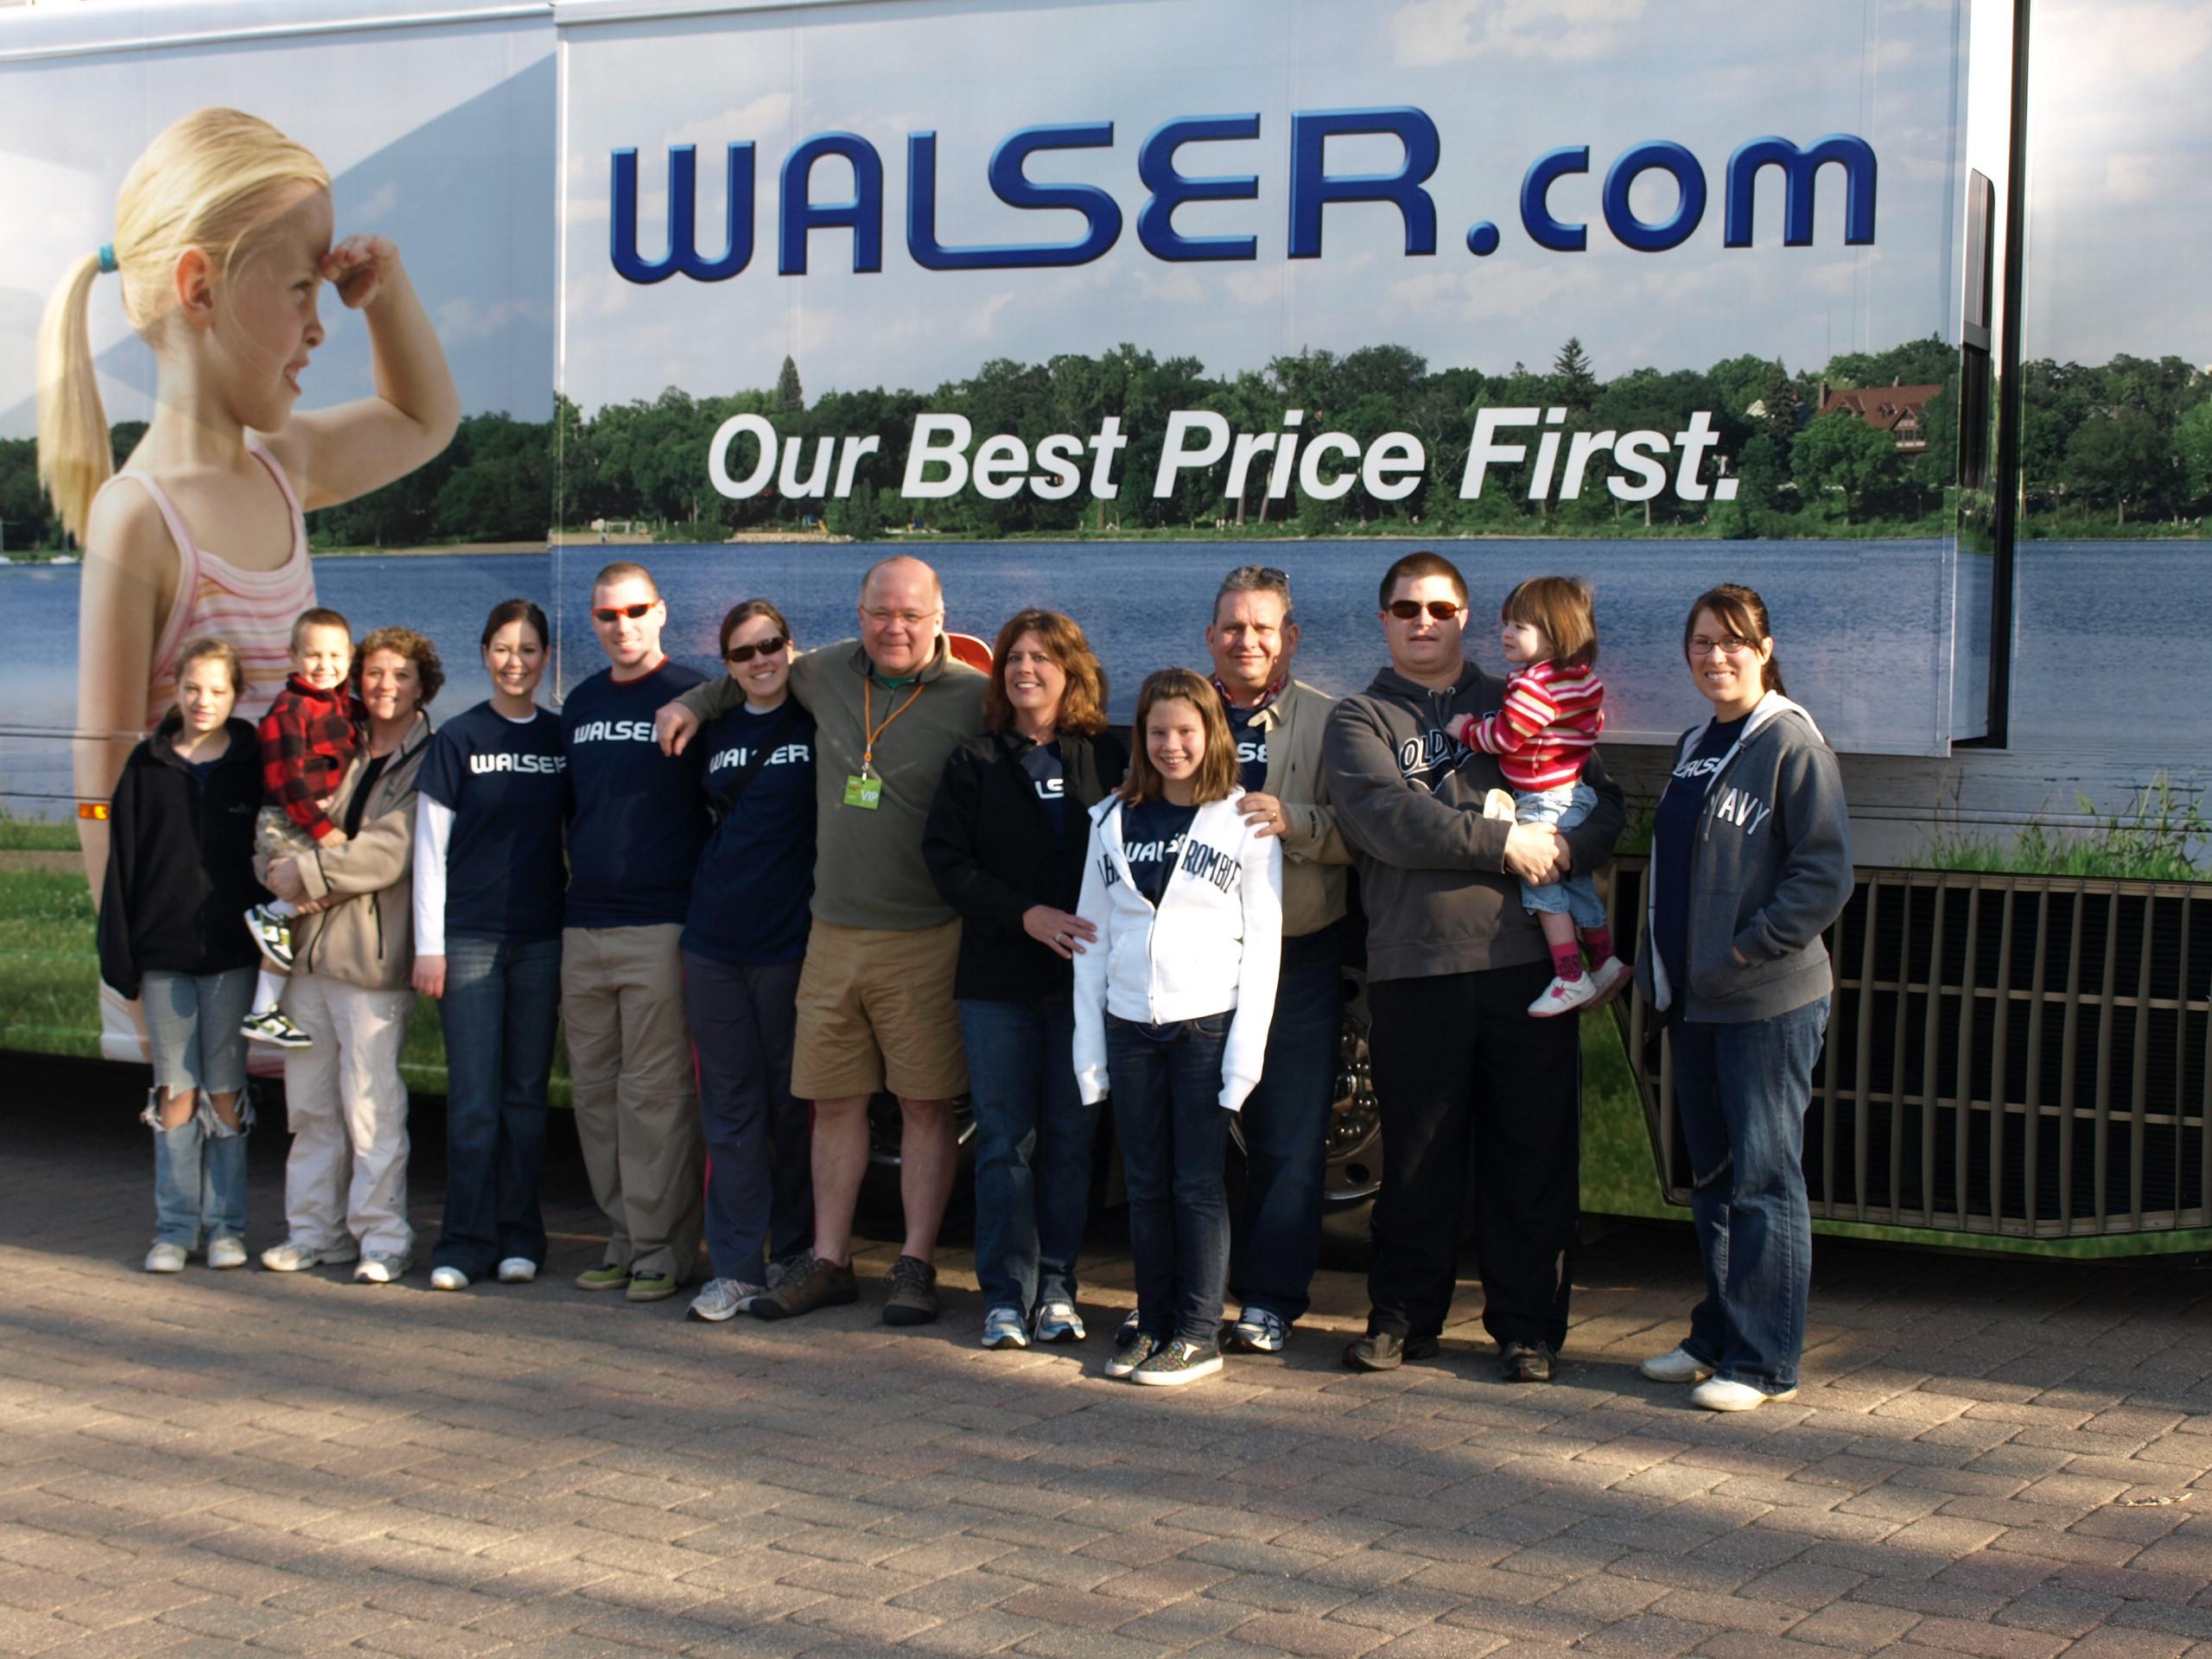 walser foundation